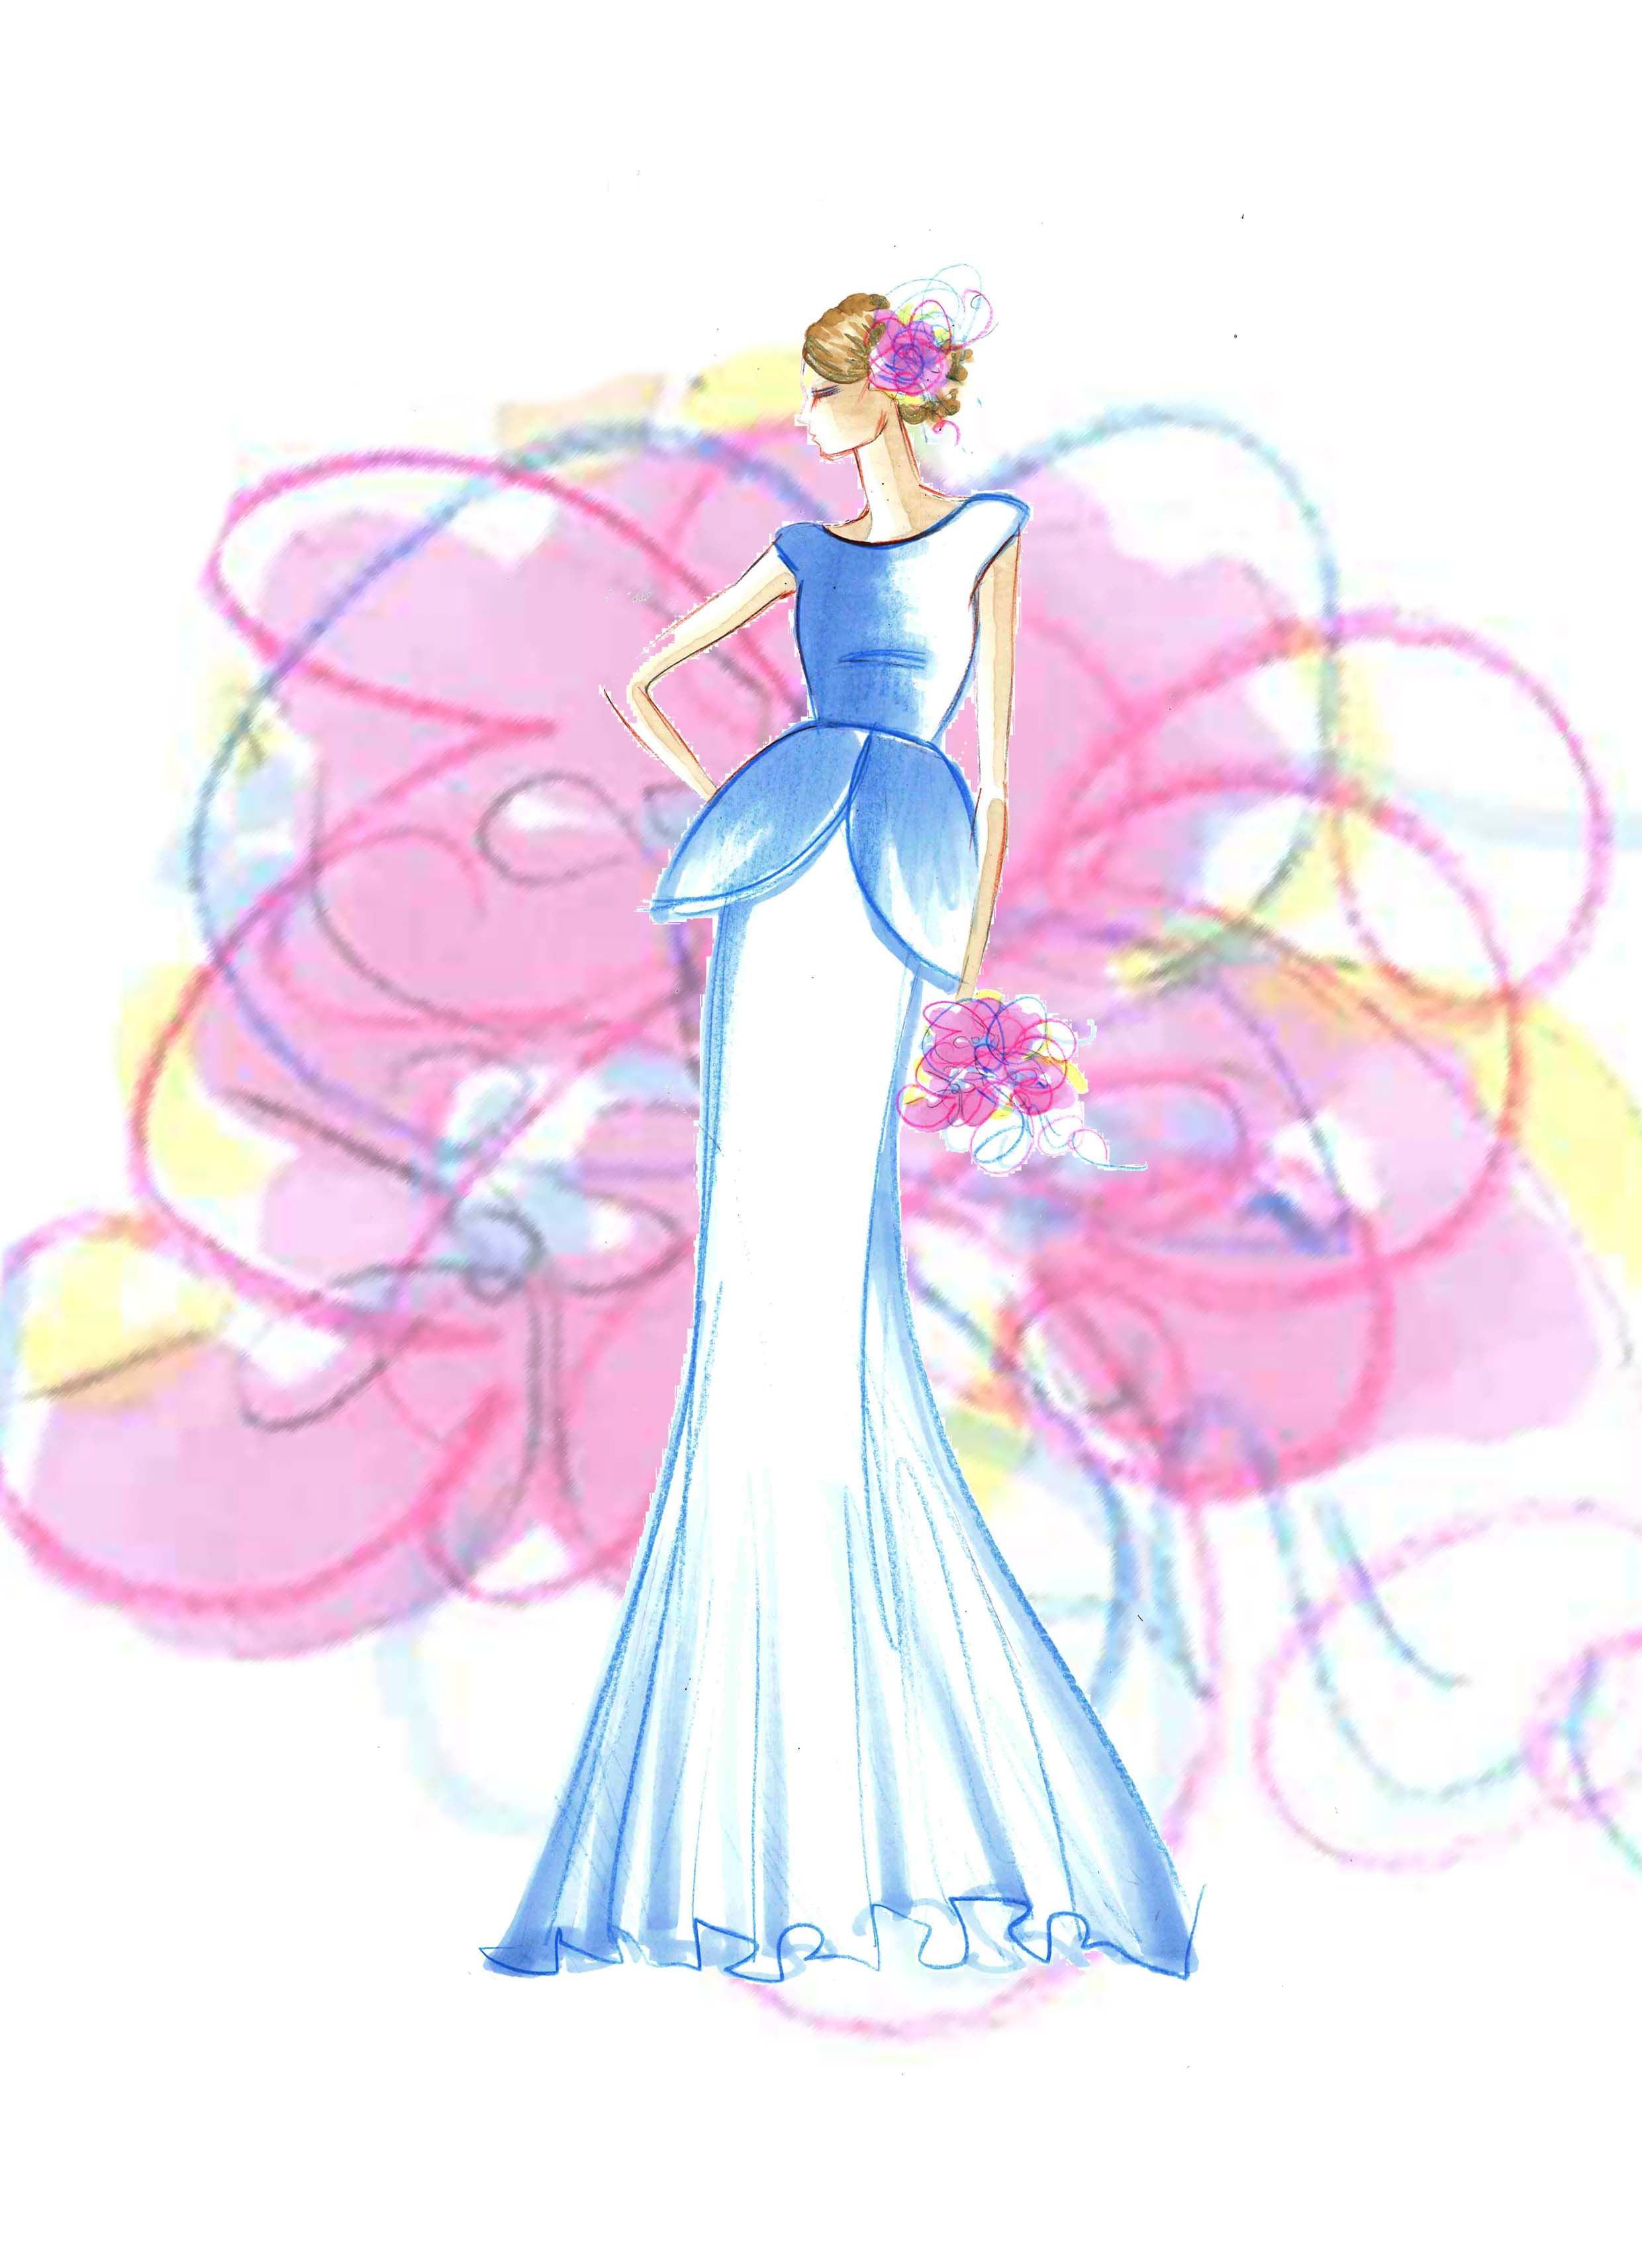 abito da sposa peplo  - Mariana Cino #marianacinofashiondesigner #bride #sposa #marriage #flowers #white #springbride #peplo #fiori #pink #blue